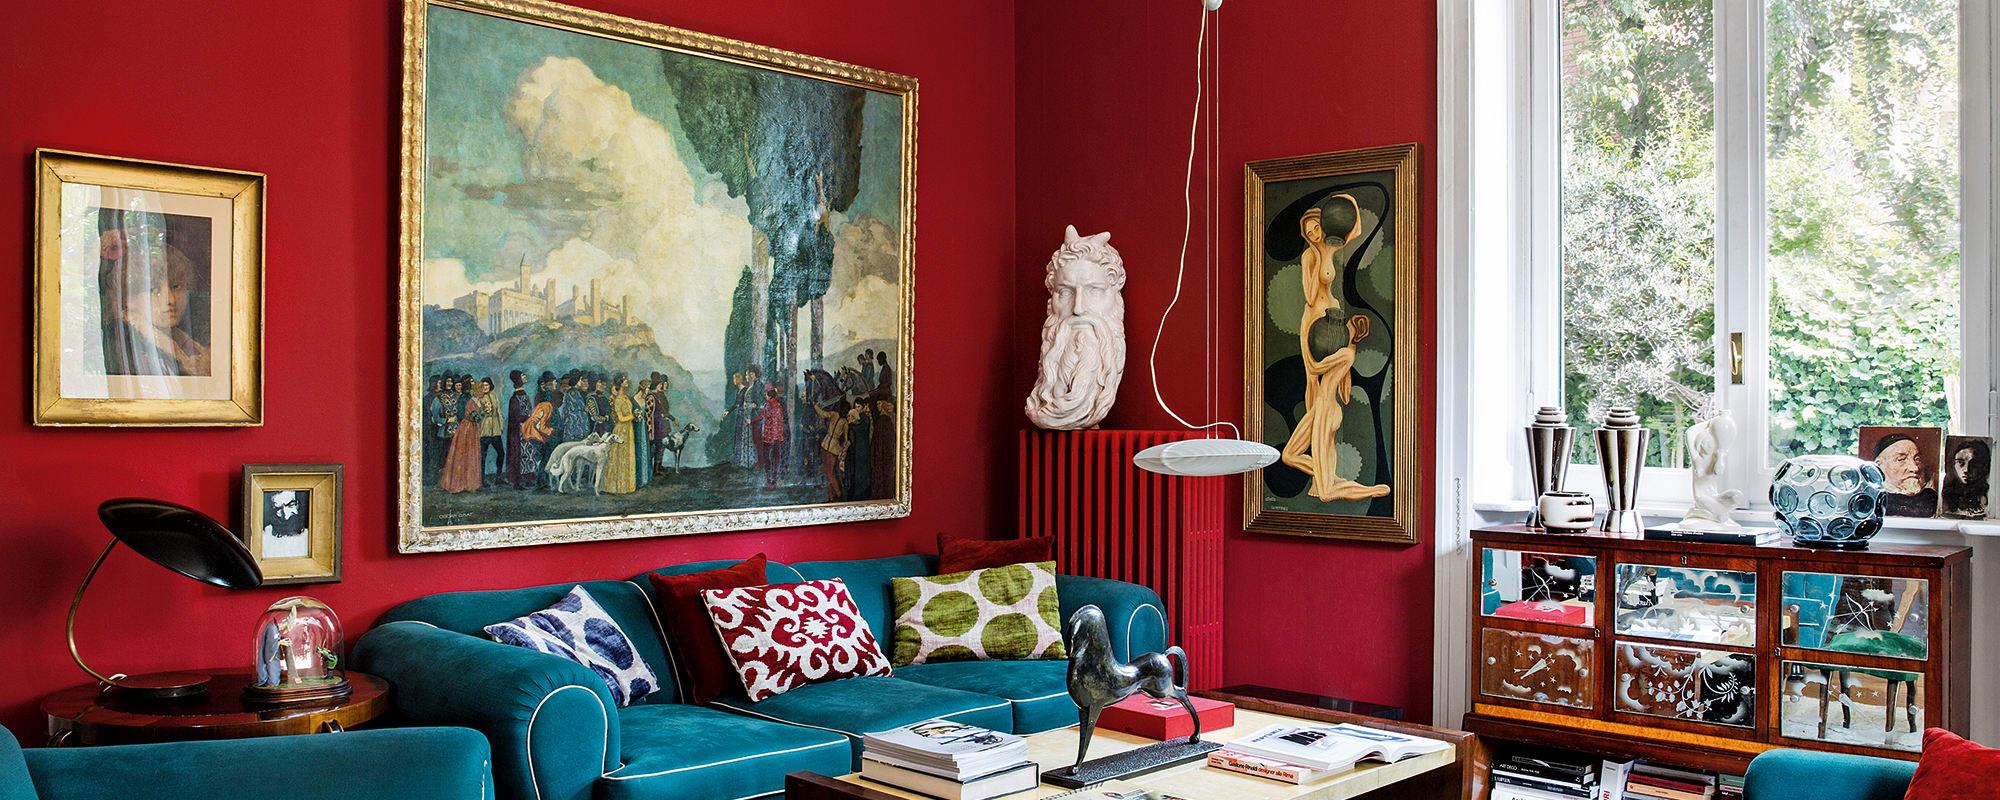 oskar graf gemälde, guillermo ulrich sofa, Luca Vitali Apartment